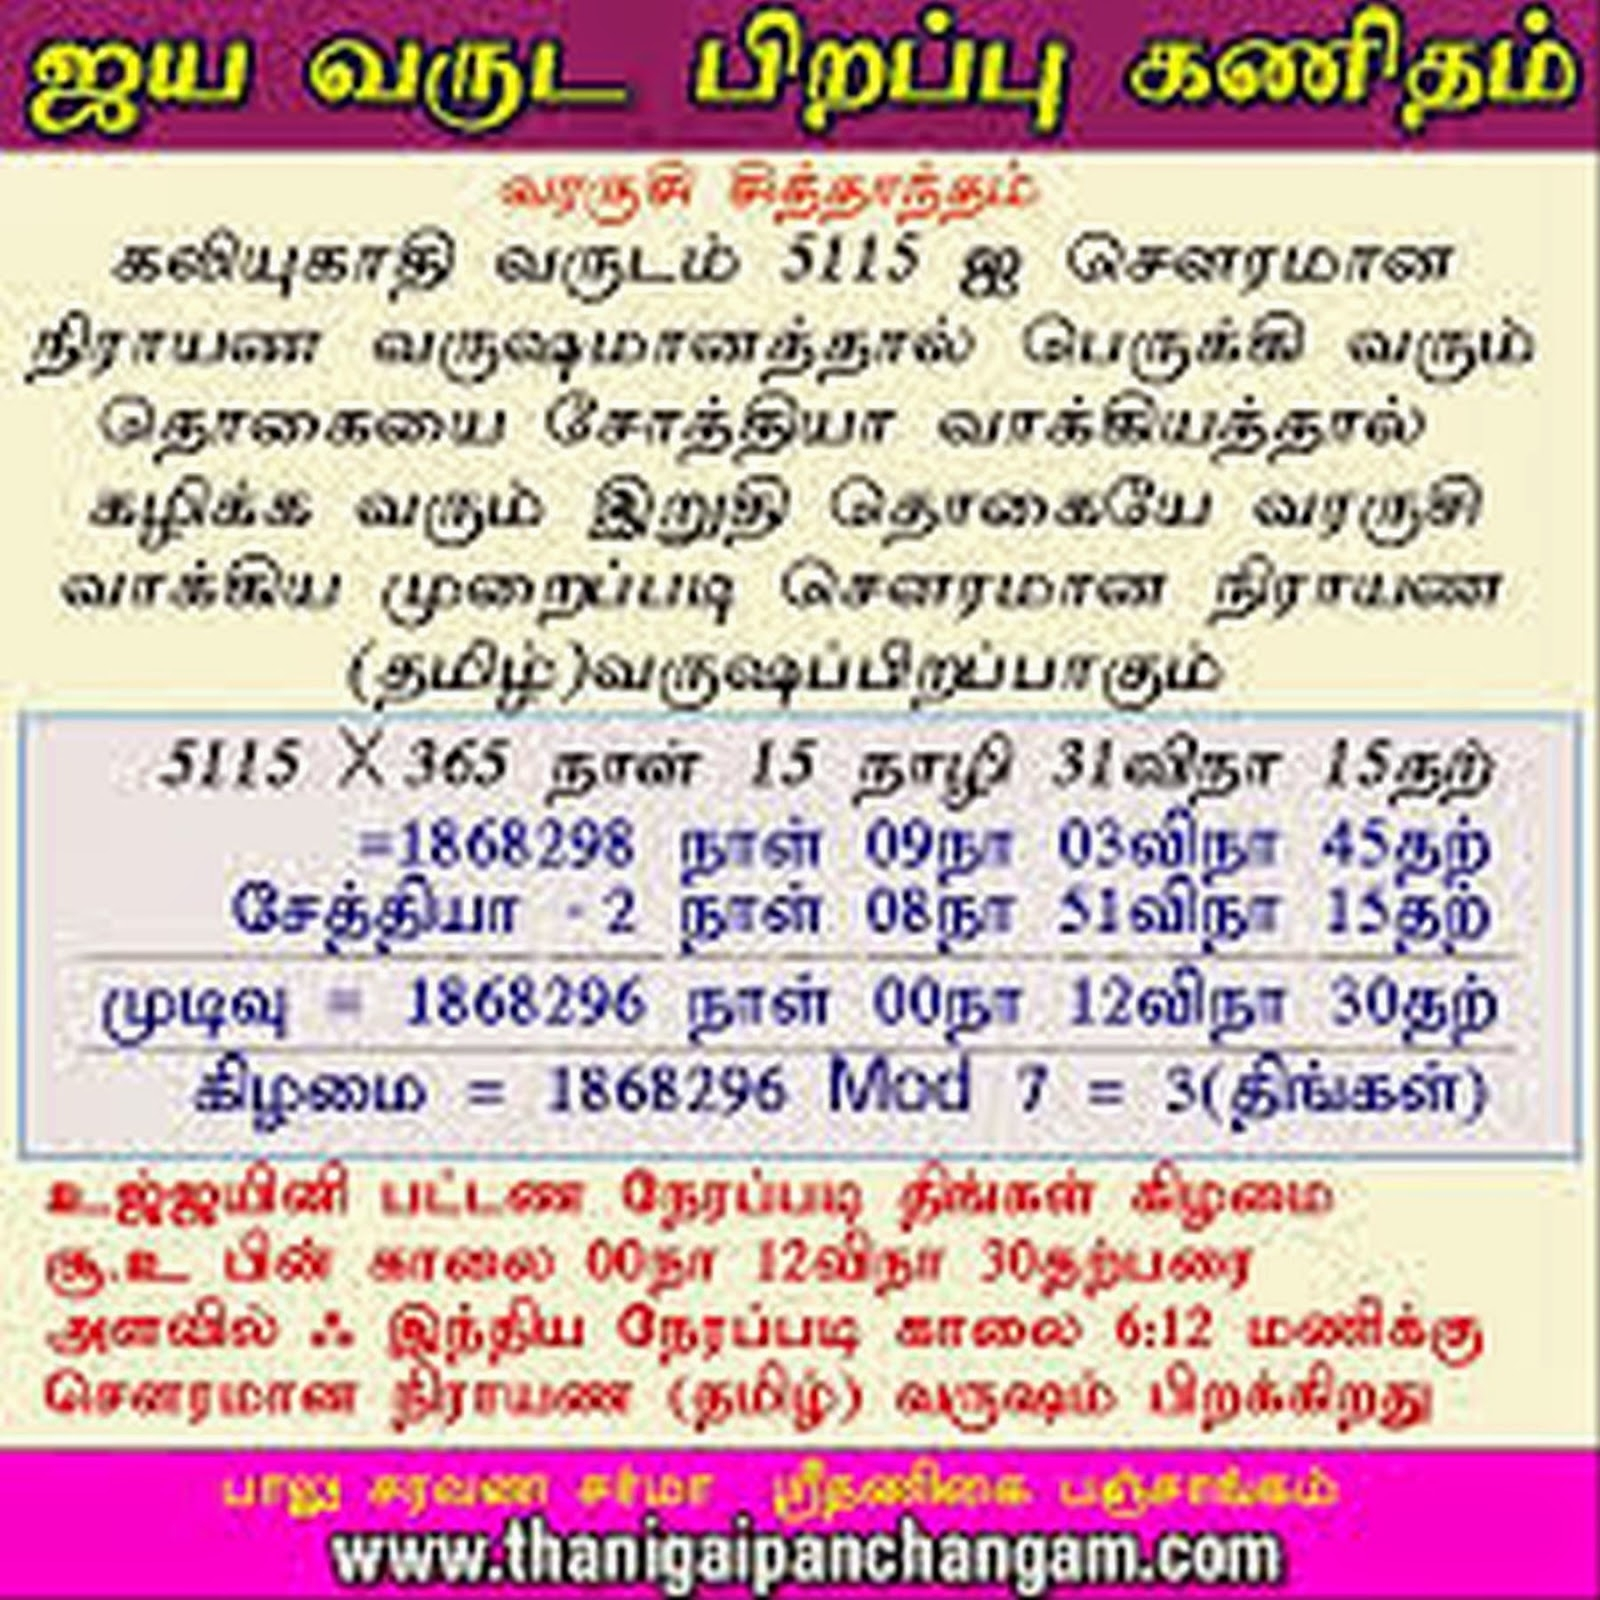 Know Your Hindu Religion: Tamil Panchangam (Almanac)